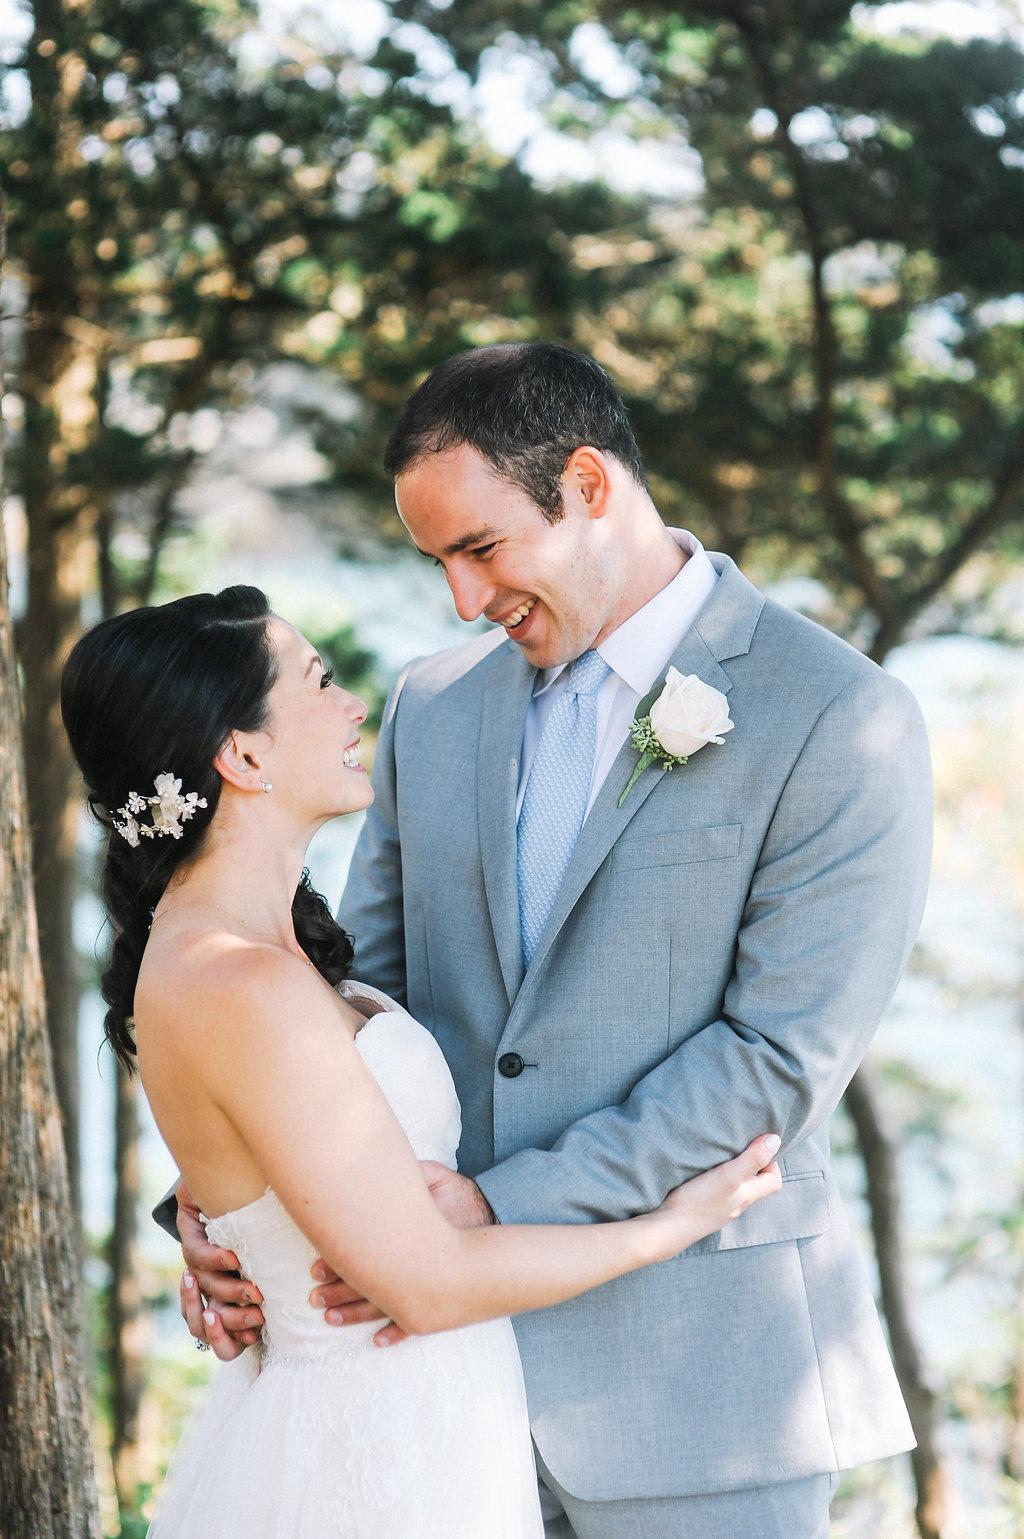 BrideGroomPortraits_Dragonline_Studios_Jamestown_RI_Wedding-32.jpg